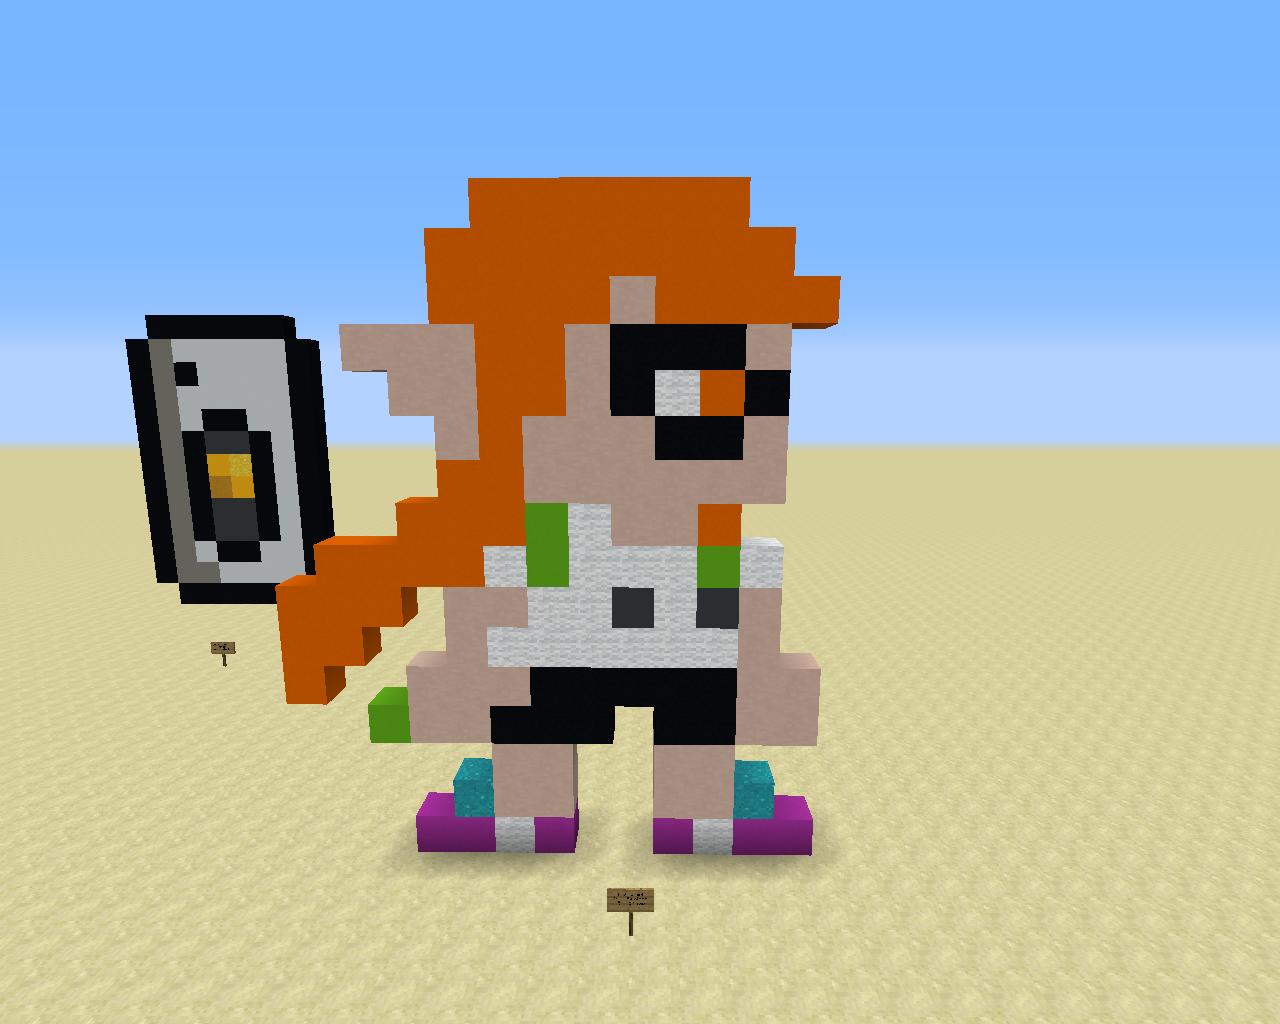 The orange Inkling Girl from Splatoon as she appears in Super Mario Maker.